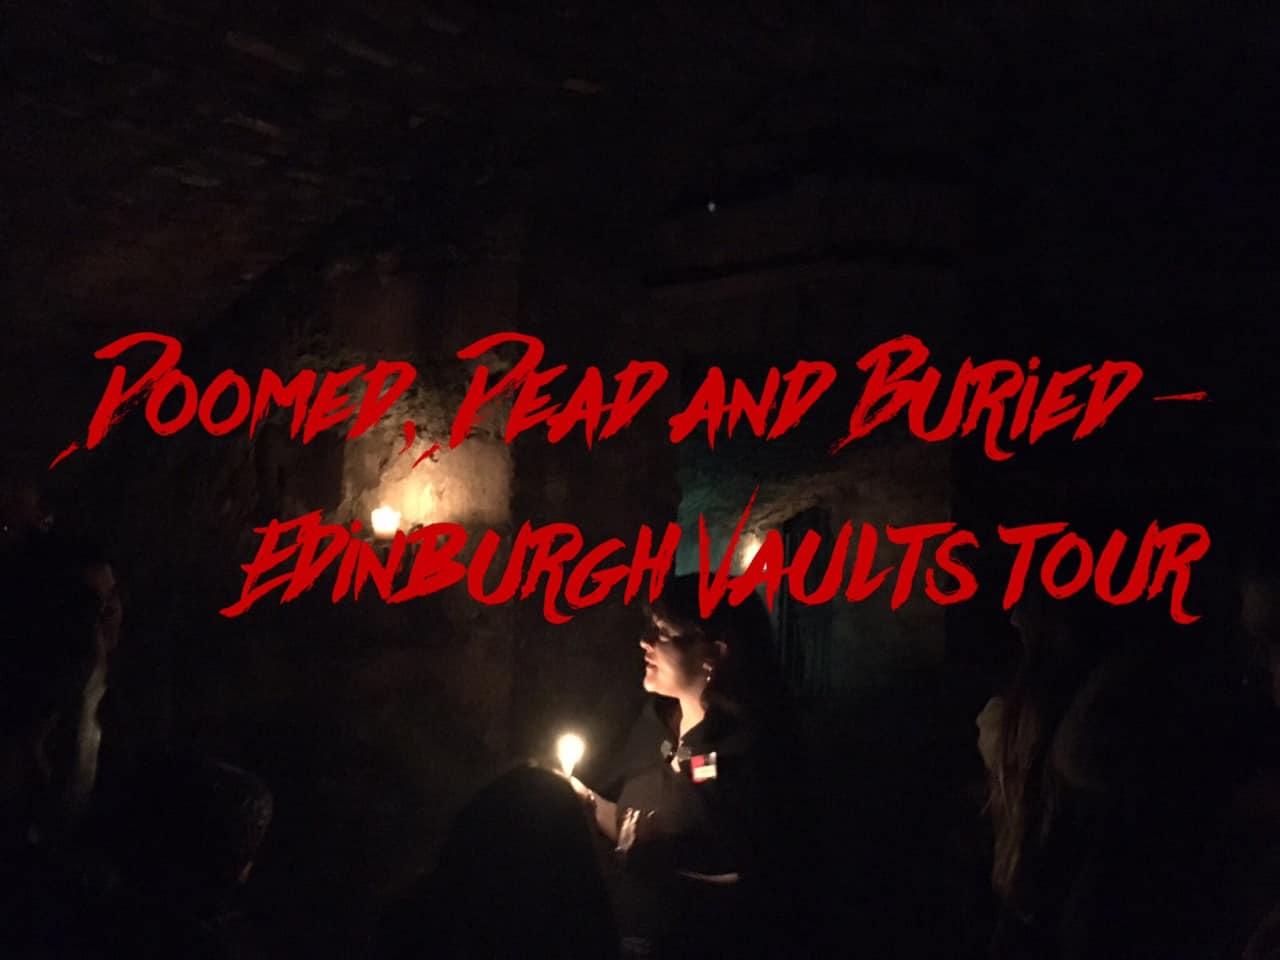 Edinburgh Vaults Tour with Mercat - the best tour in Edinburgh